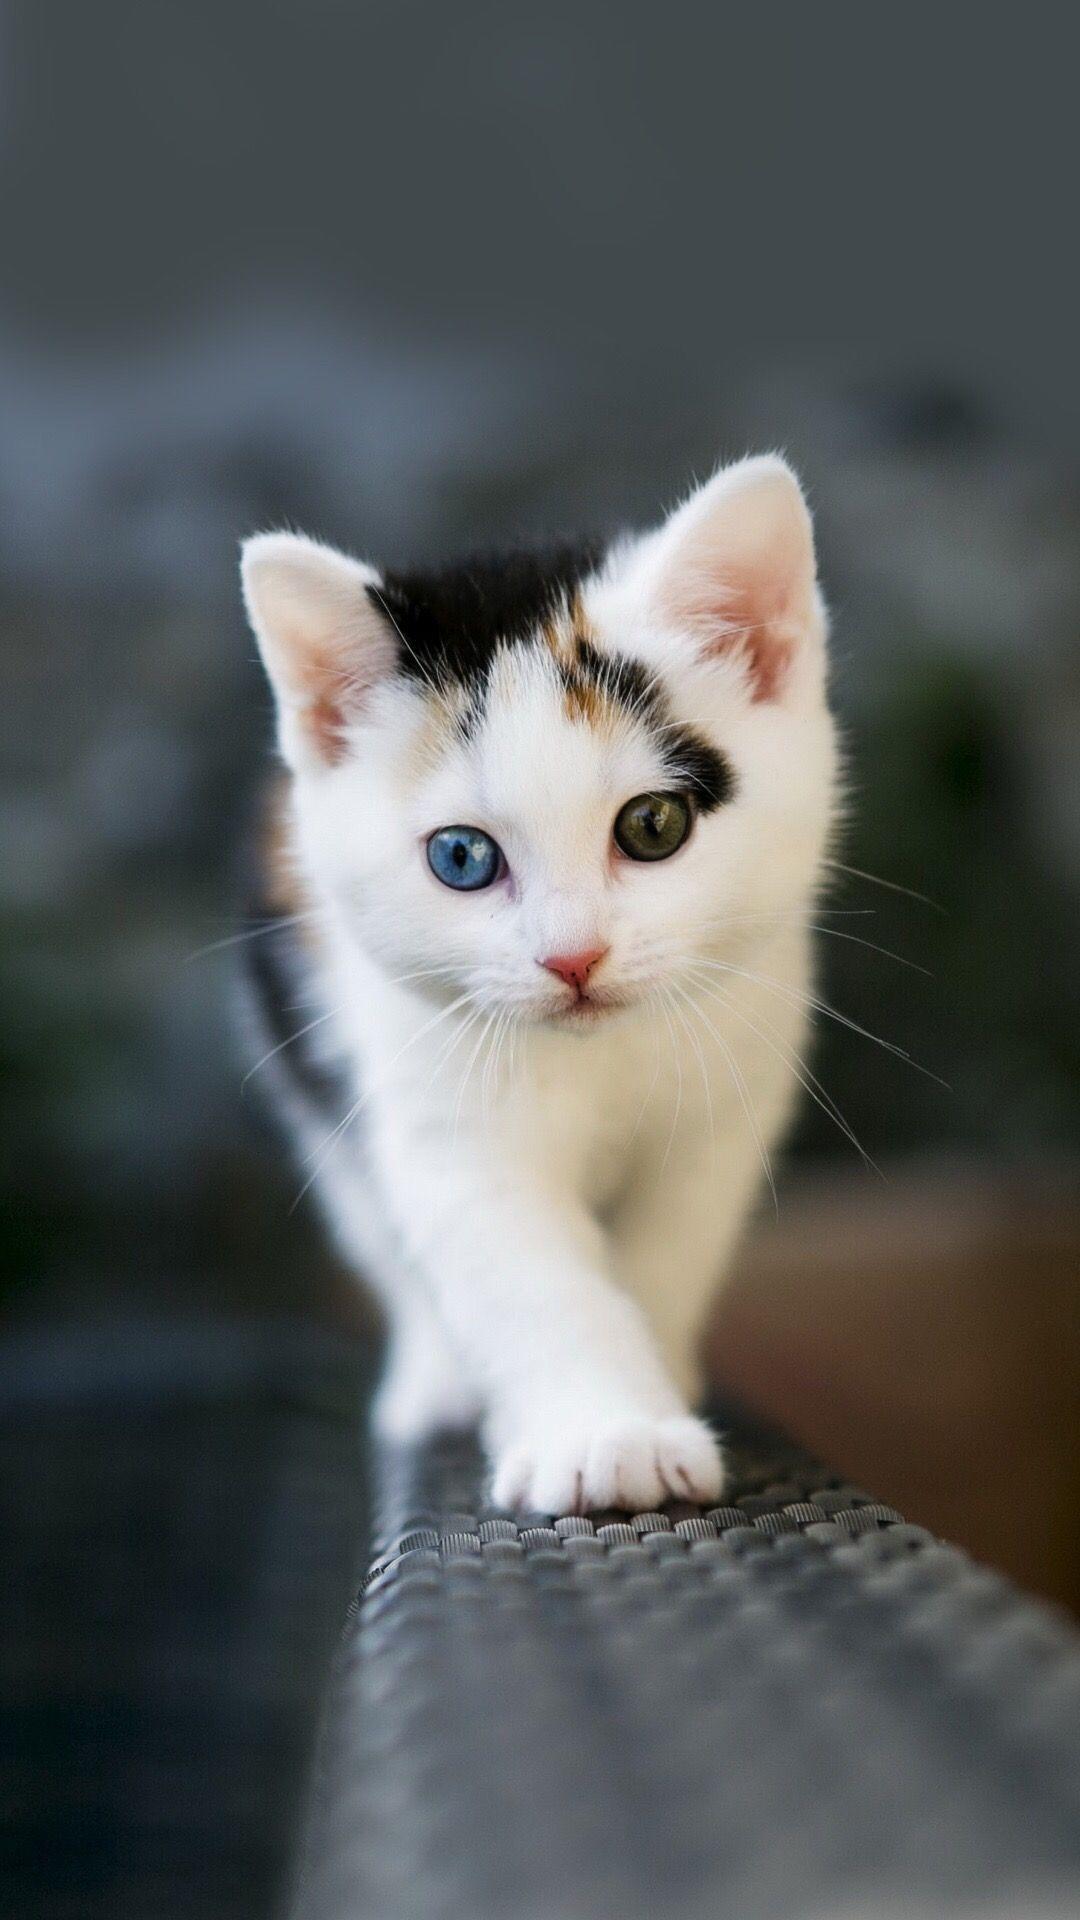 Kitty Cat Kittens Cutest Cute Cat Wallpaper Cute Cats